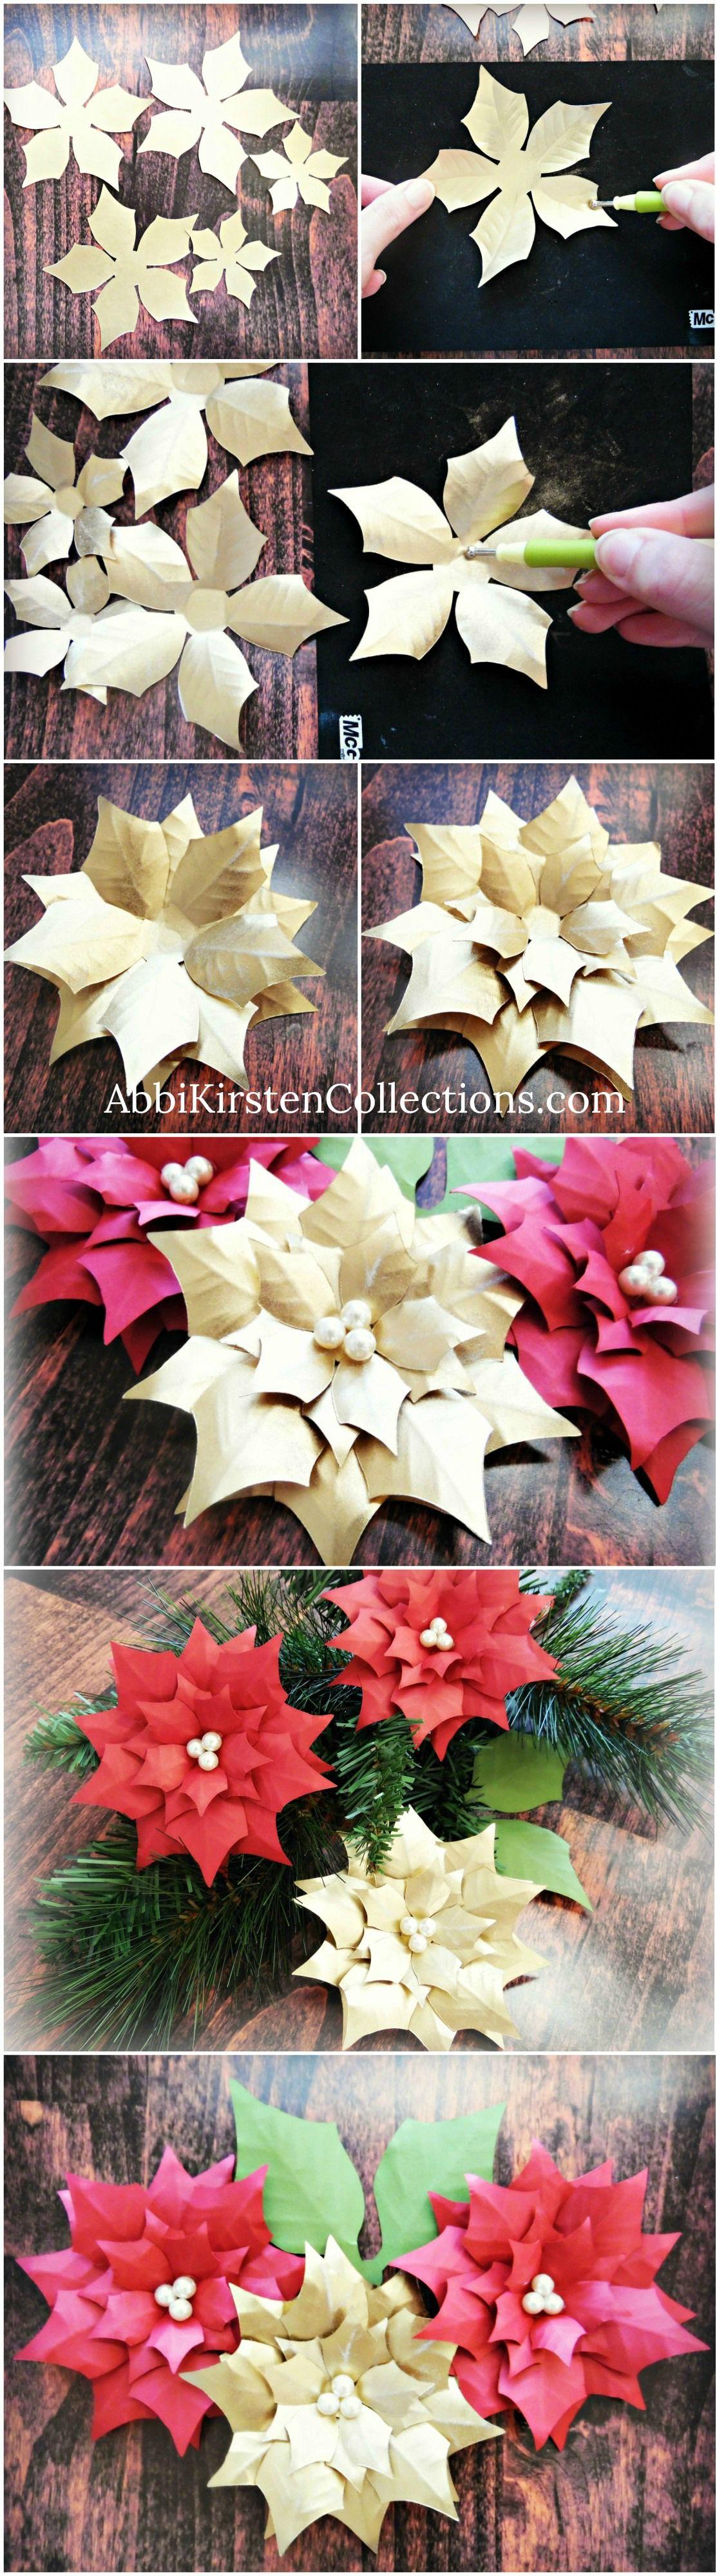 Small Poinsettia DIY Flower Templates  Holidays  Pinterest  Paper